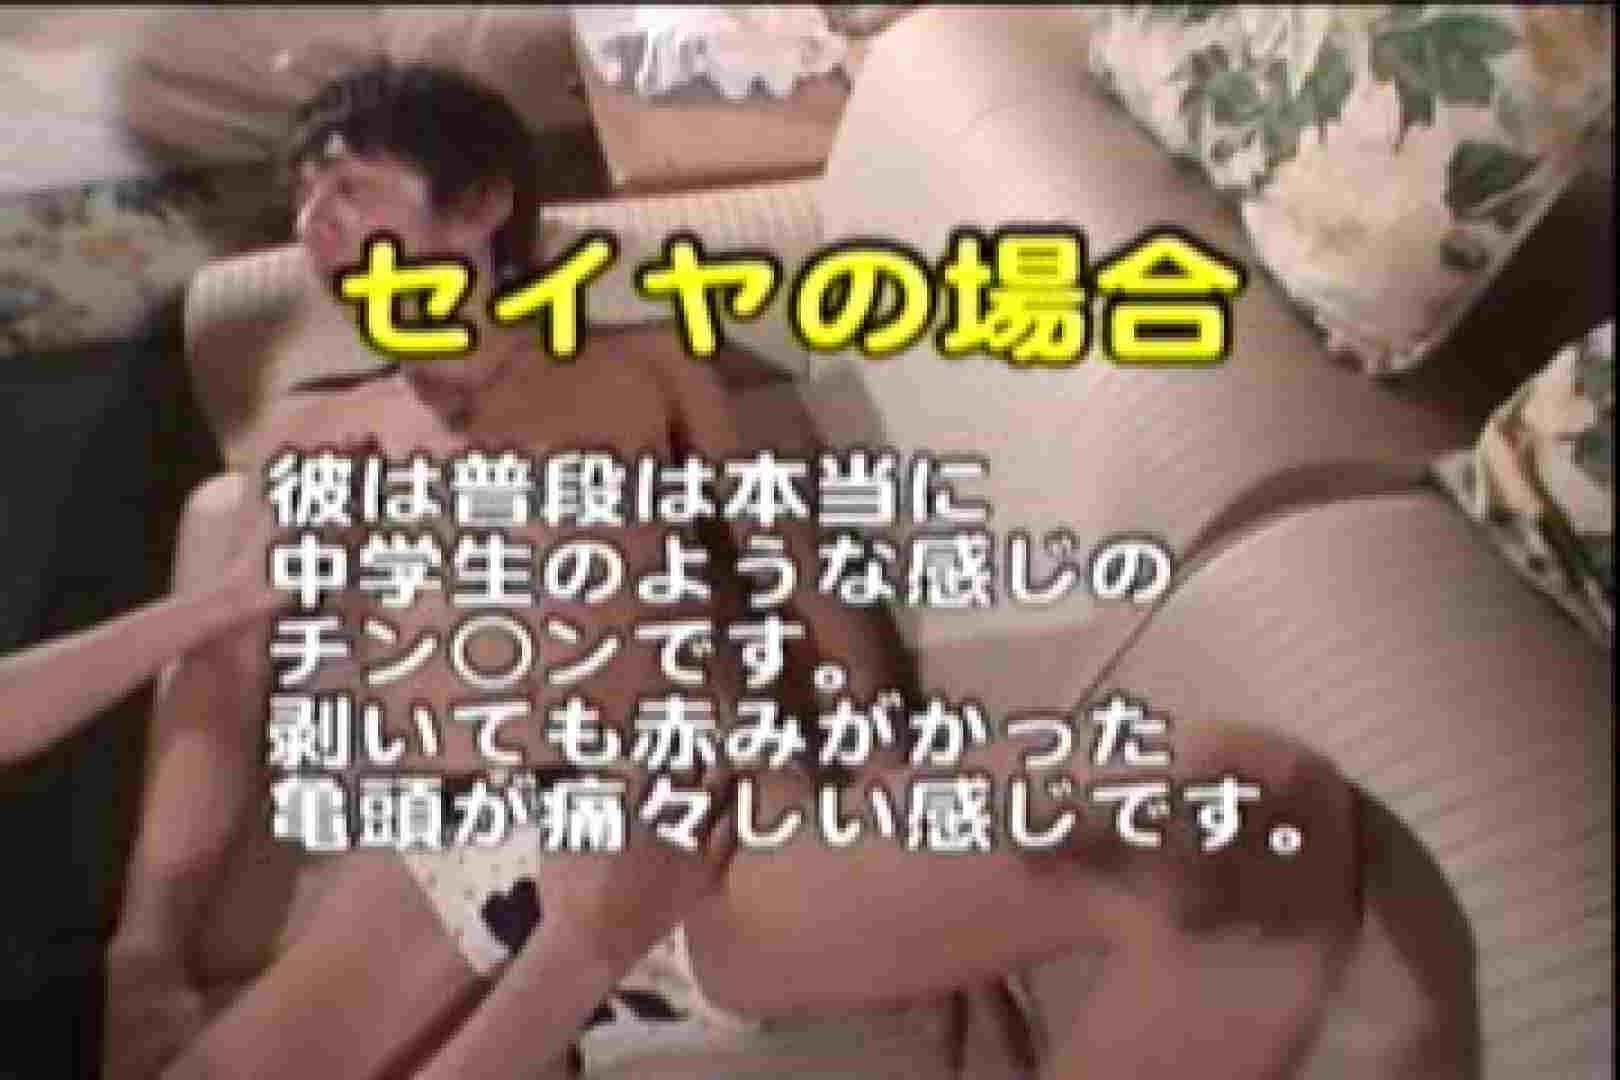 BABY FACEな包茎事情!!4FACEの快楽 射精男 ゲイ無料エロ画像 108画像 17